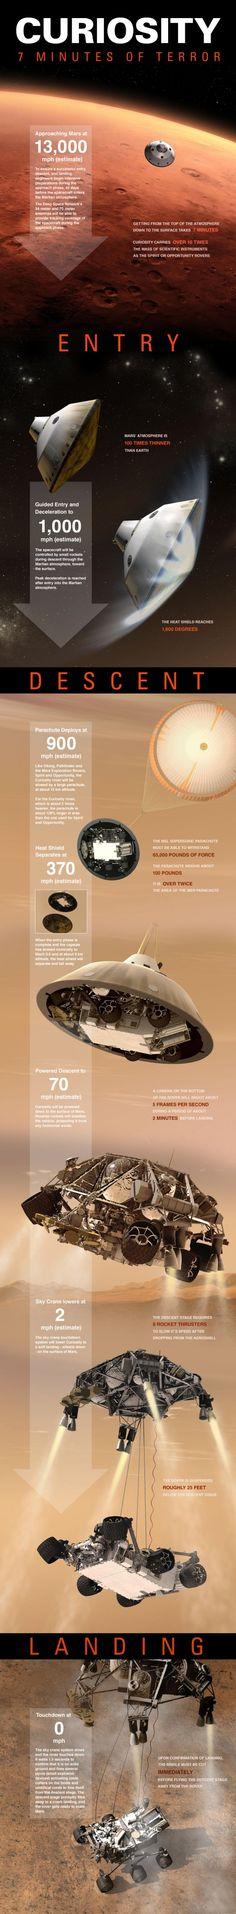 Infographie: Curiosity Mars exploration - 7 minutes of terror